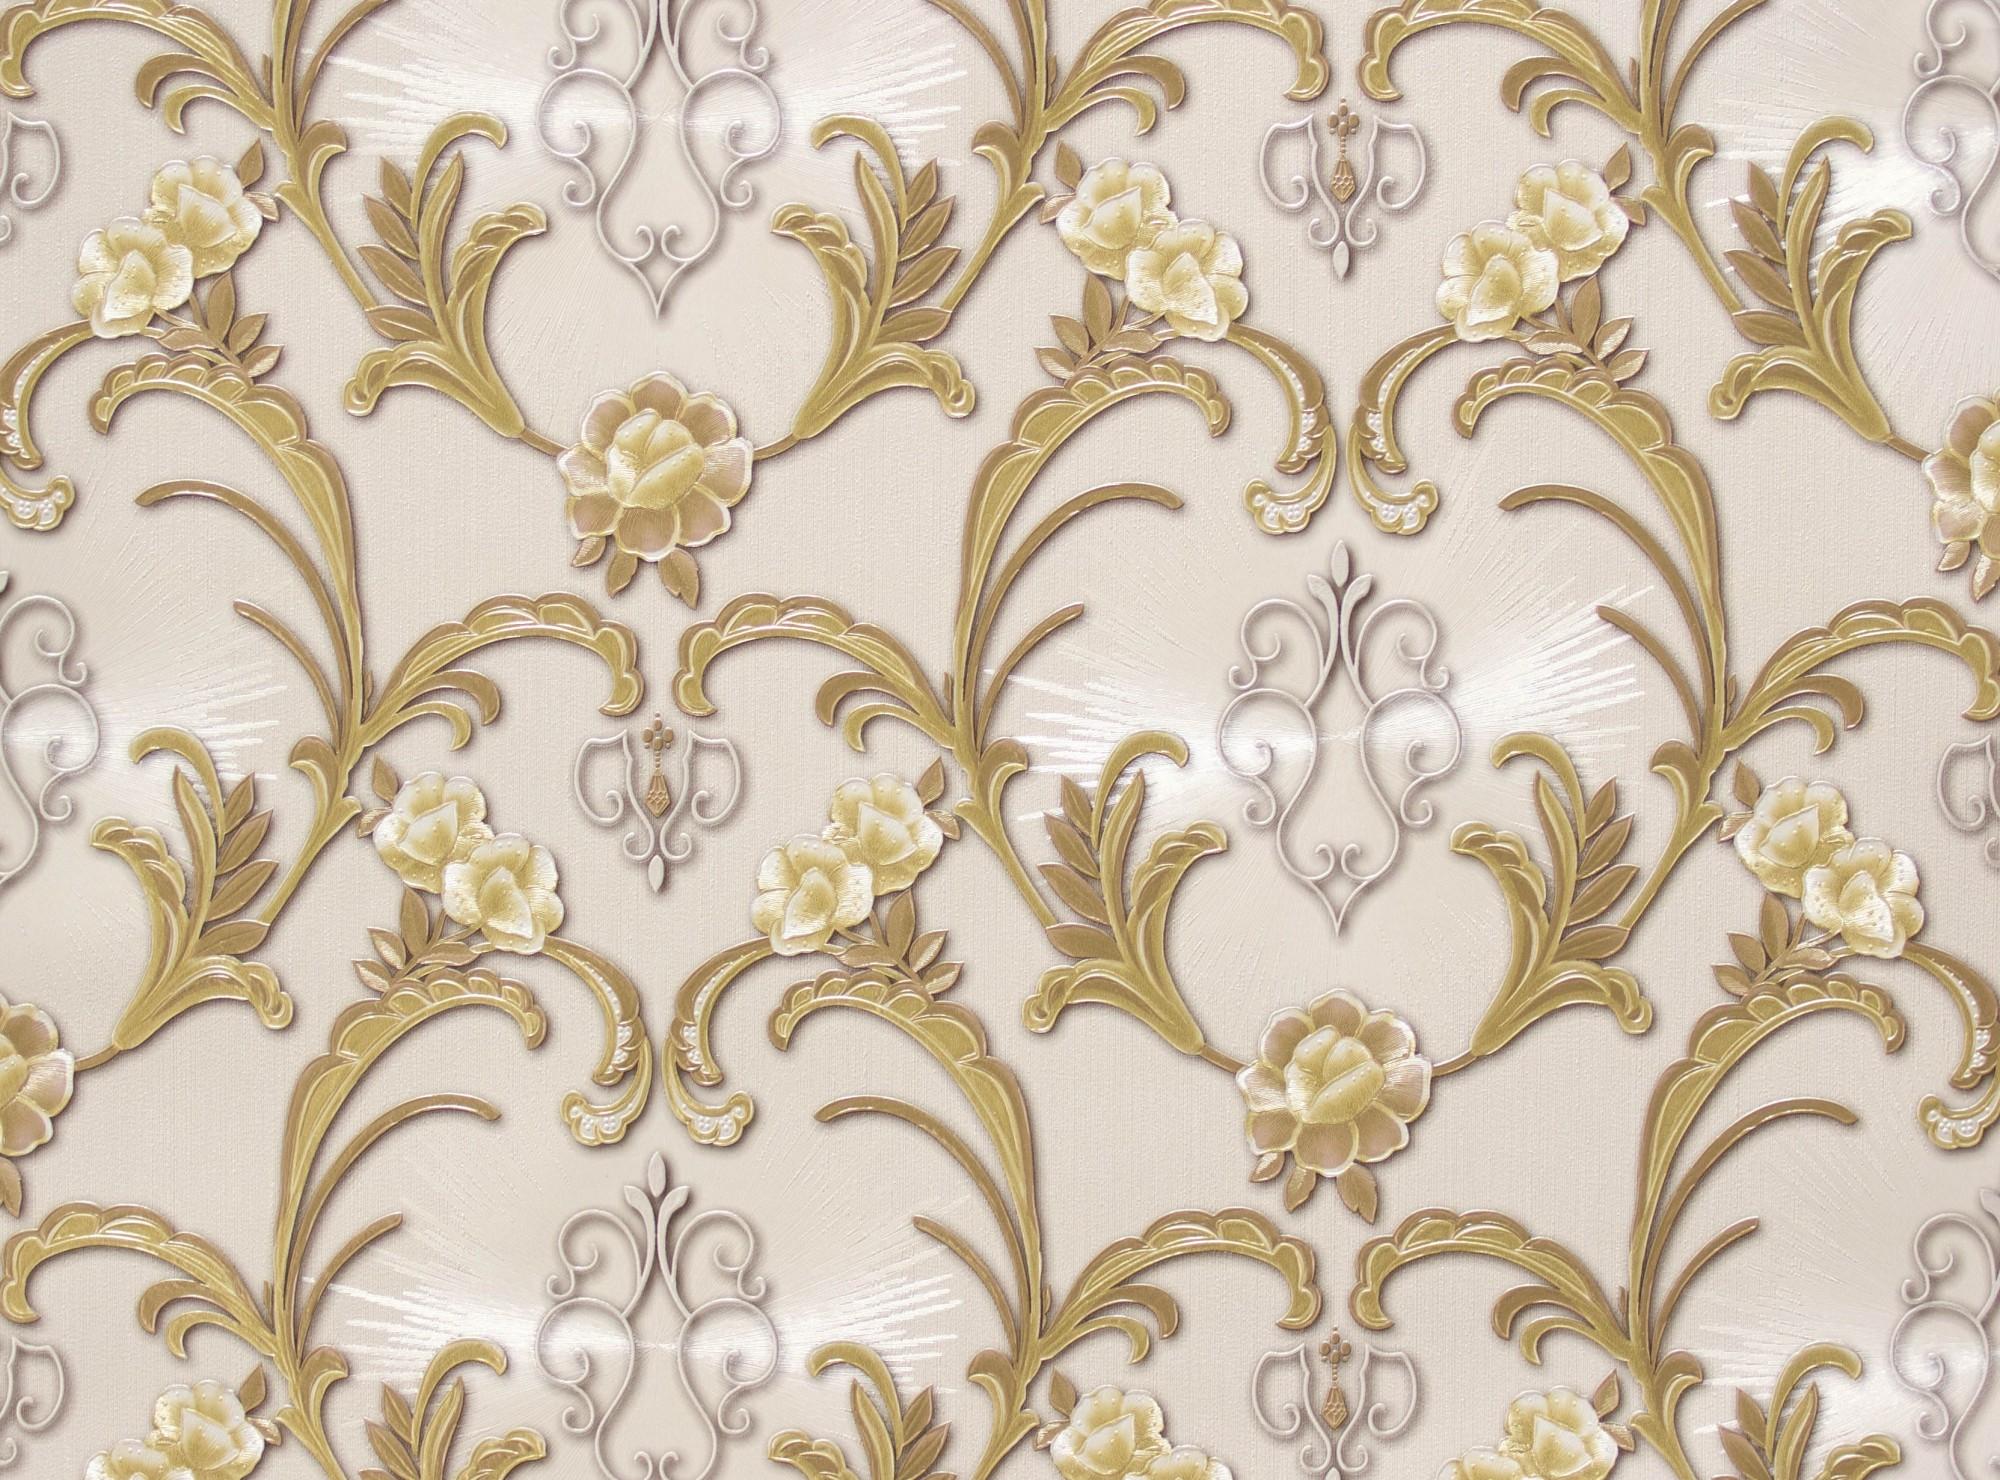 tapete hermitage ornament creme gold metallic 94338 3. Black Bedroom Furniture Sets. Home Design Ideas